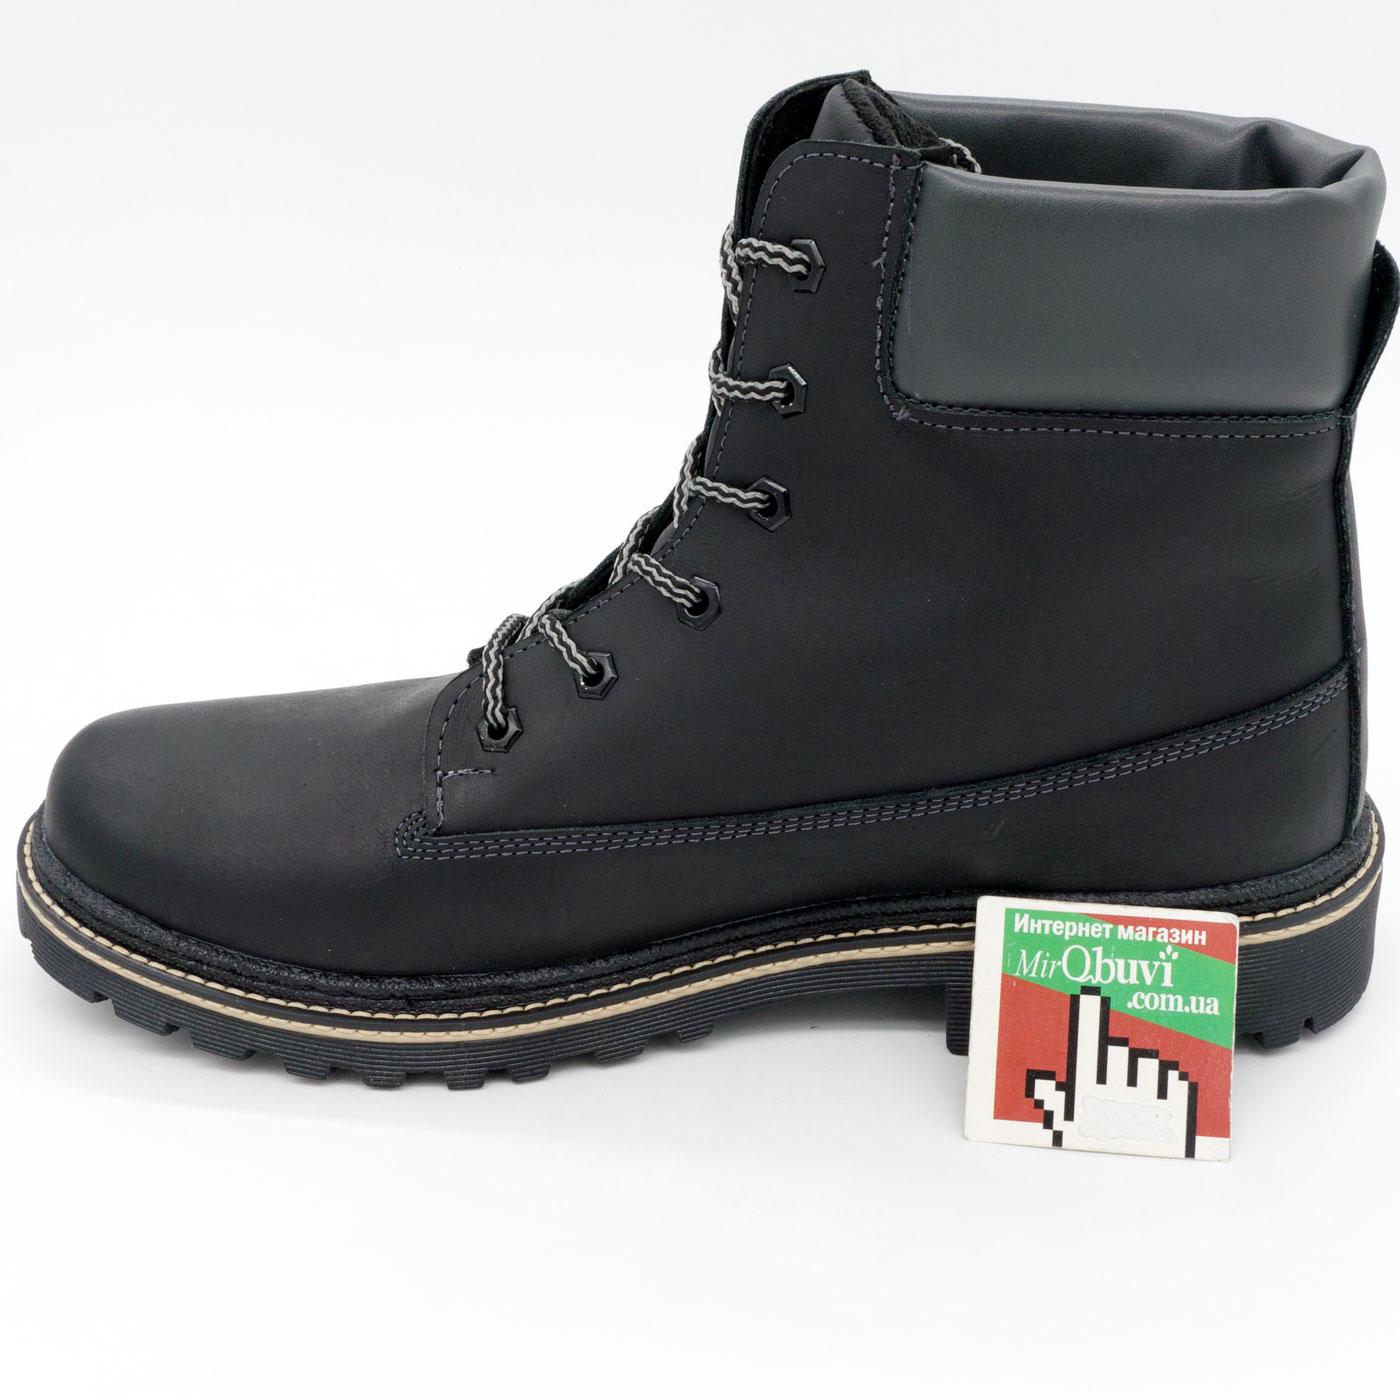 фото back Черные мужские ботинки Реплика Timberland 103 (Тимберленд)  back